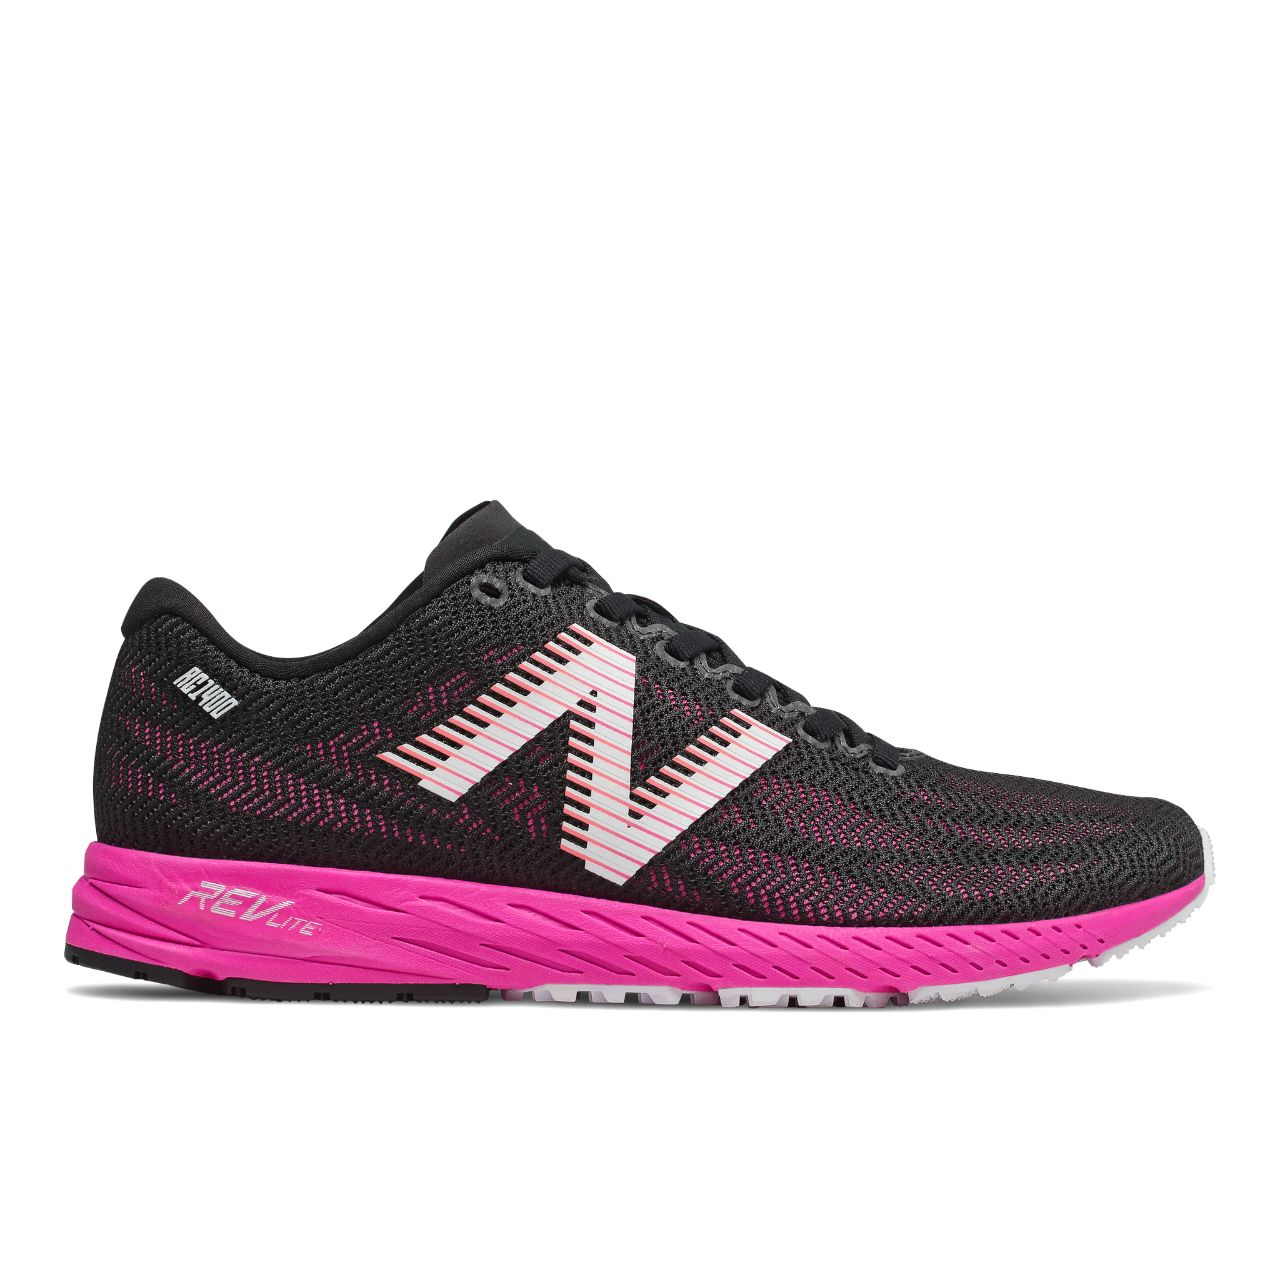 New Balance Lady 1400v6 (Schwarz Pink)